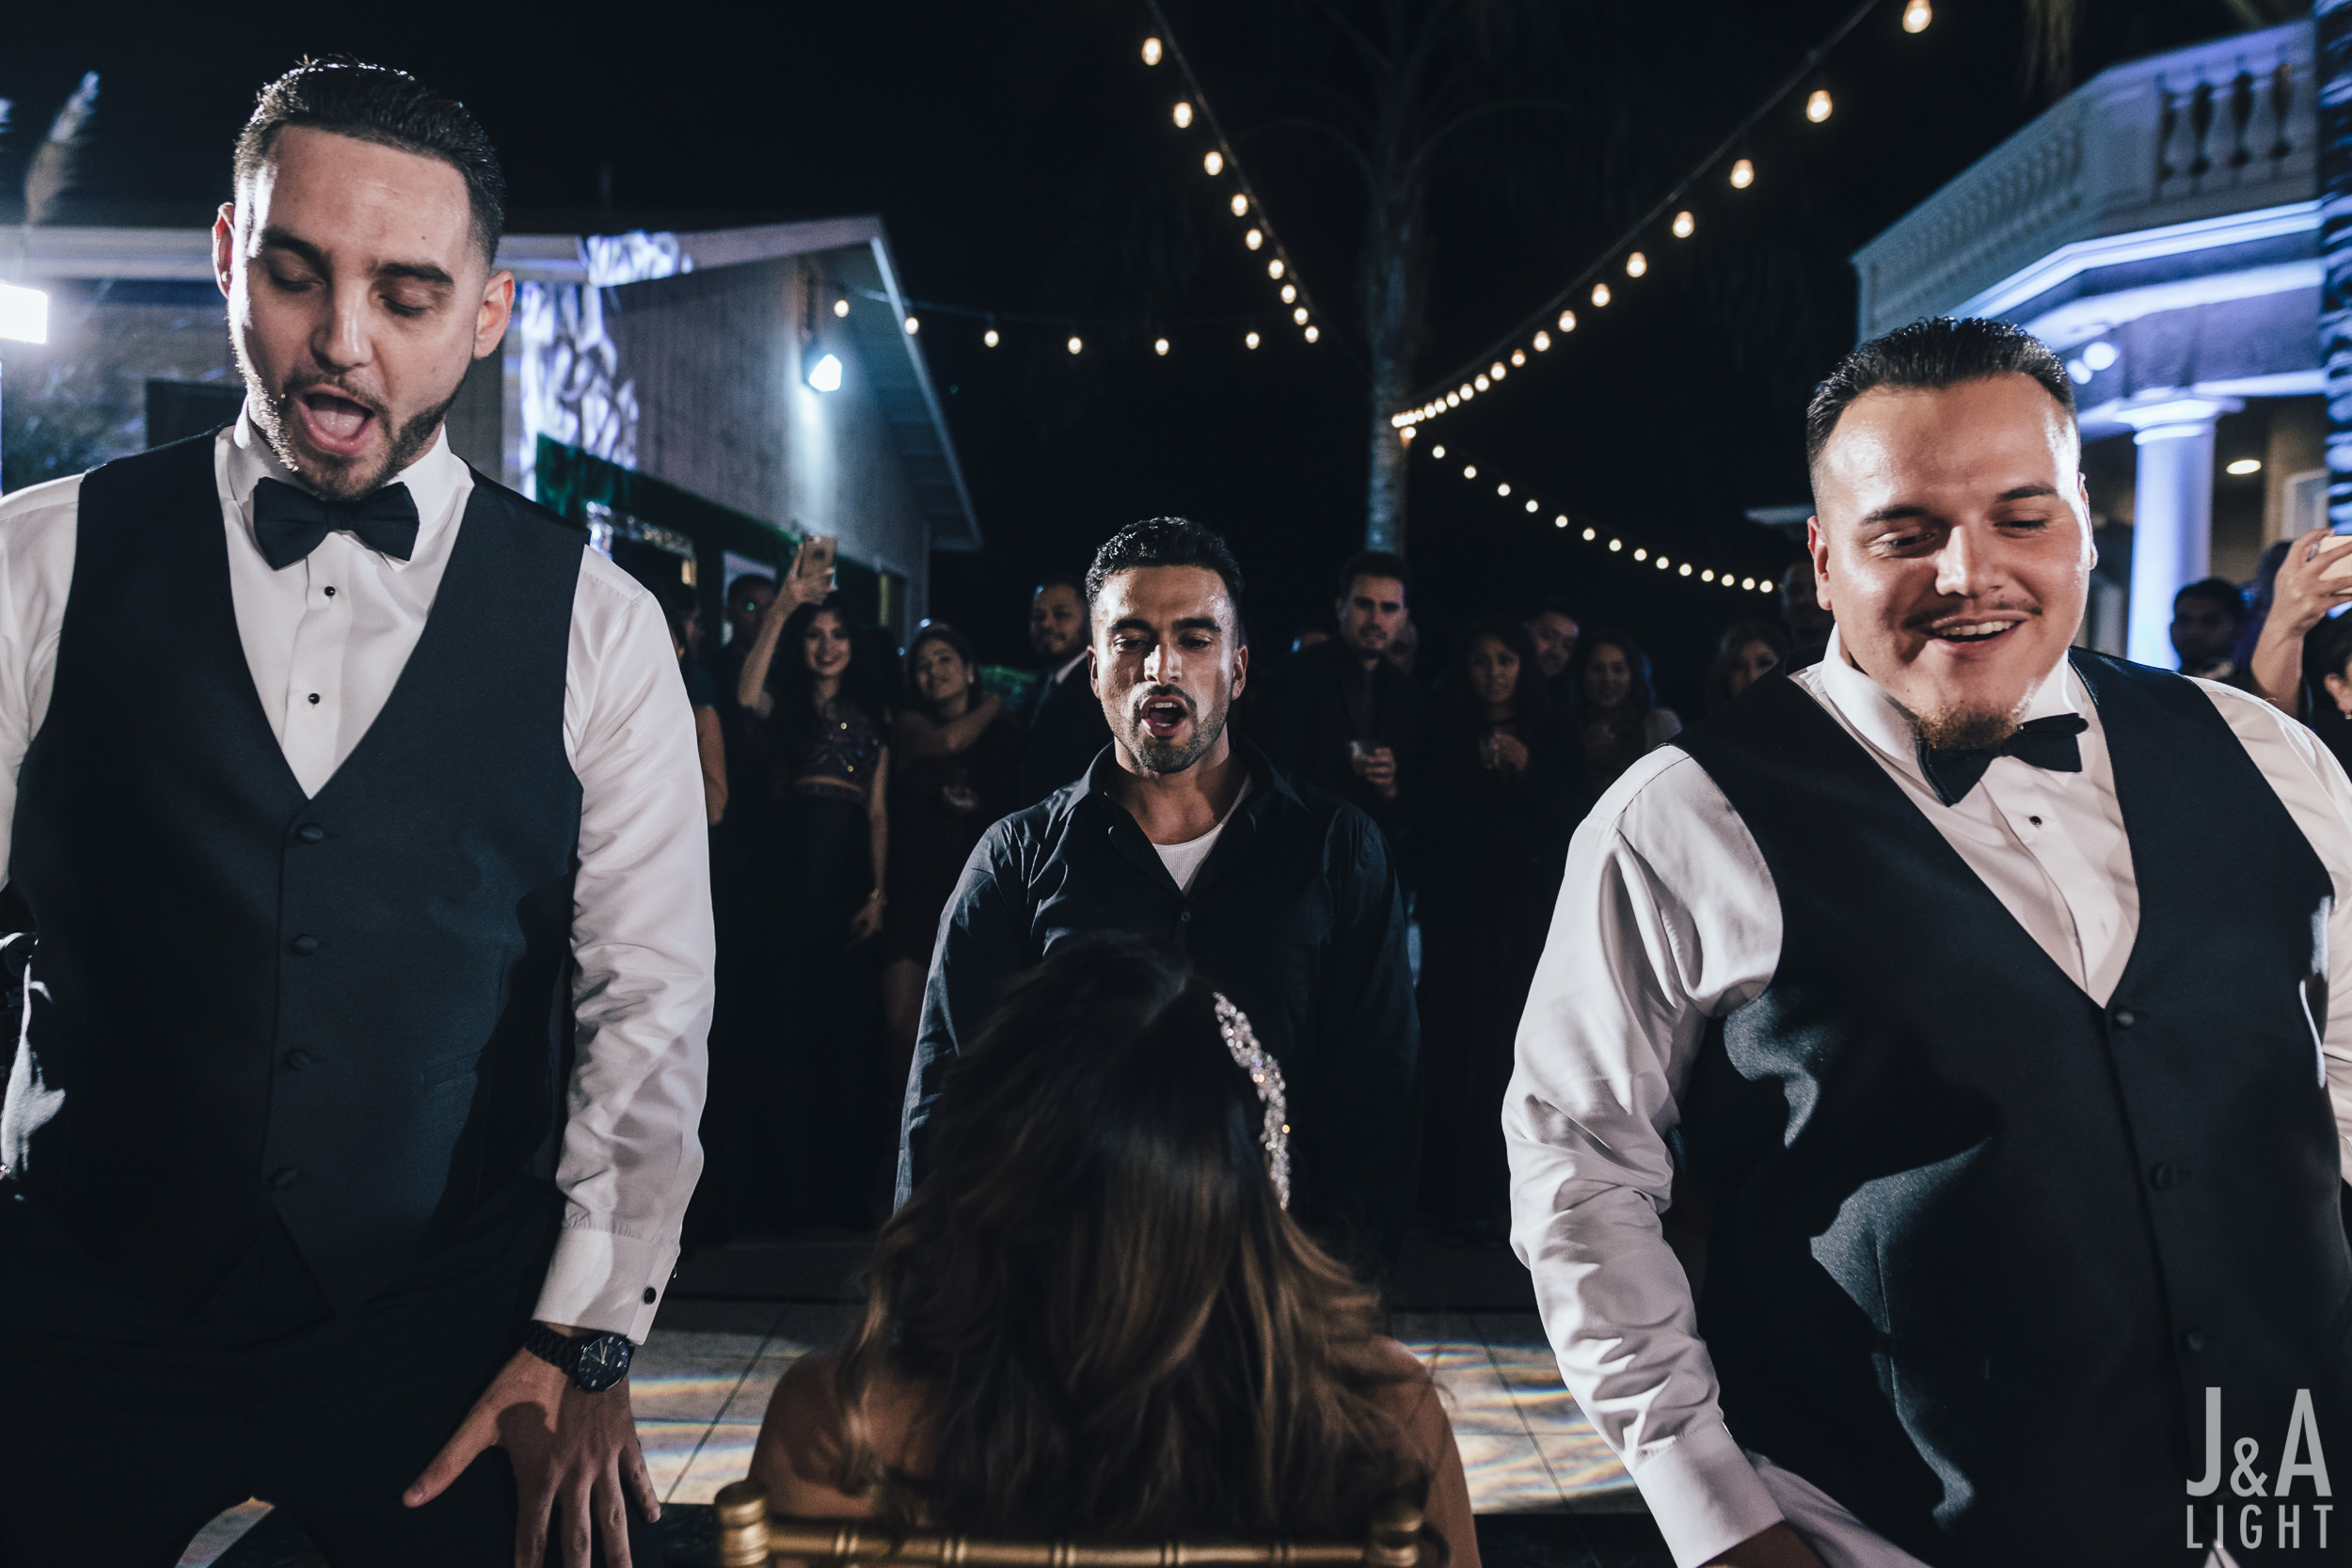 20171014-JanDan-LosBanos-GlassMansion-Wedding-Blog-089.jpg